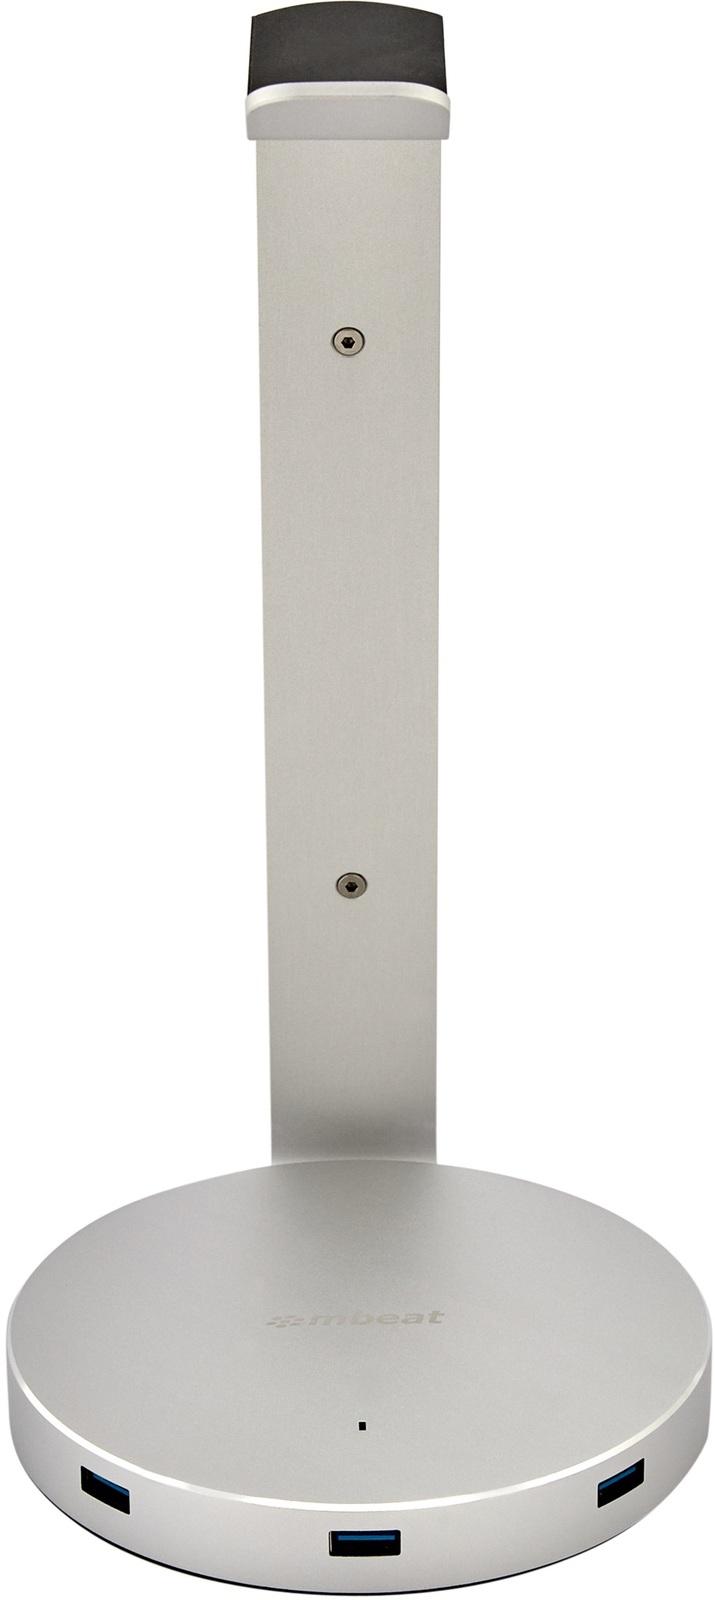 Zack Aluminum Headphone Stand + USB Hub image